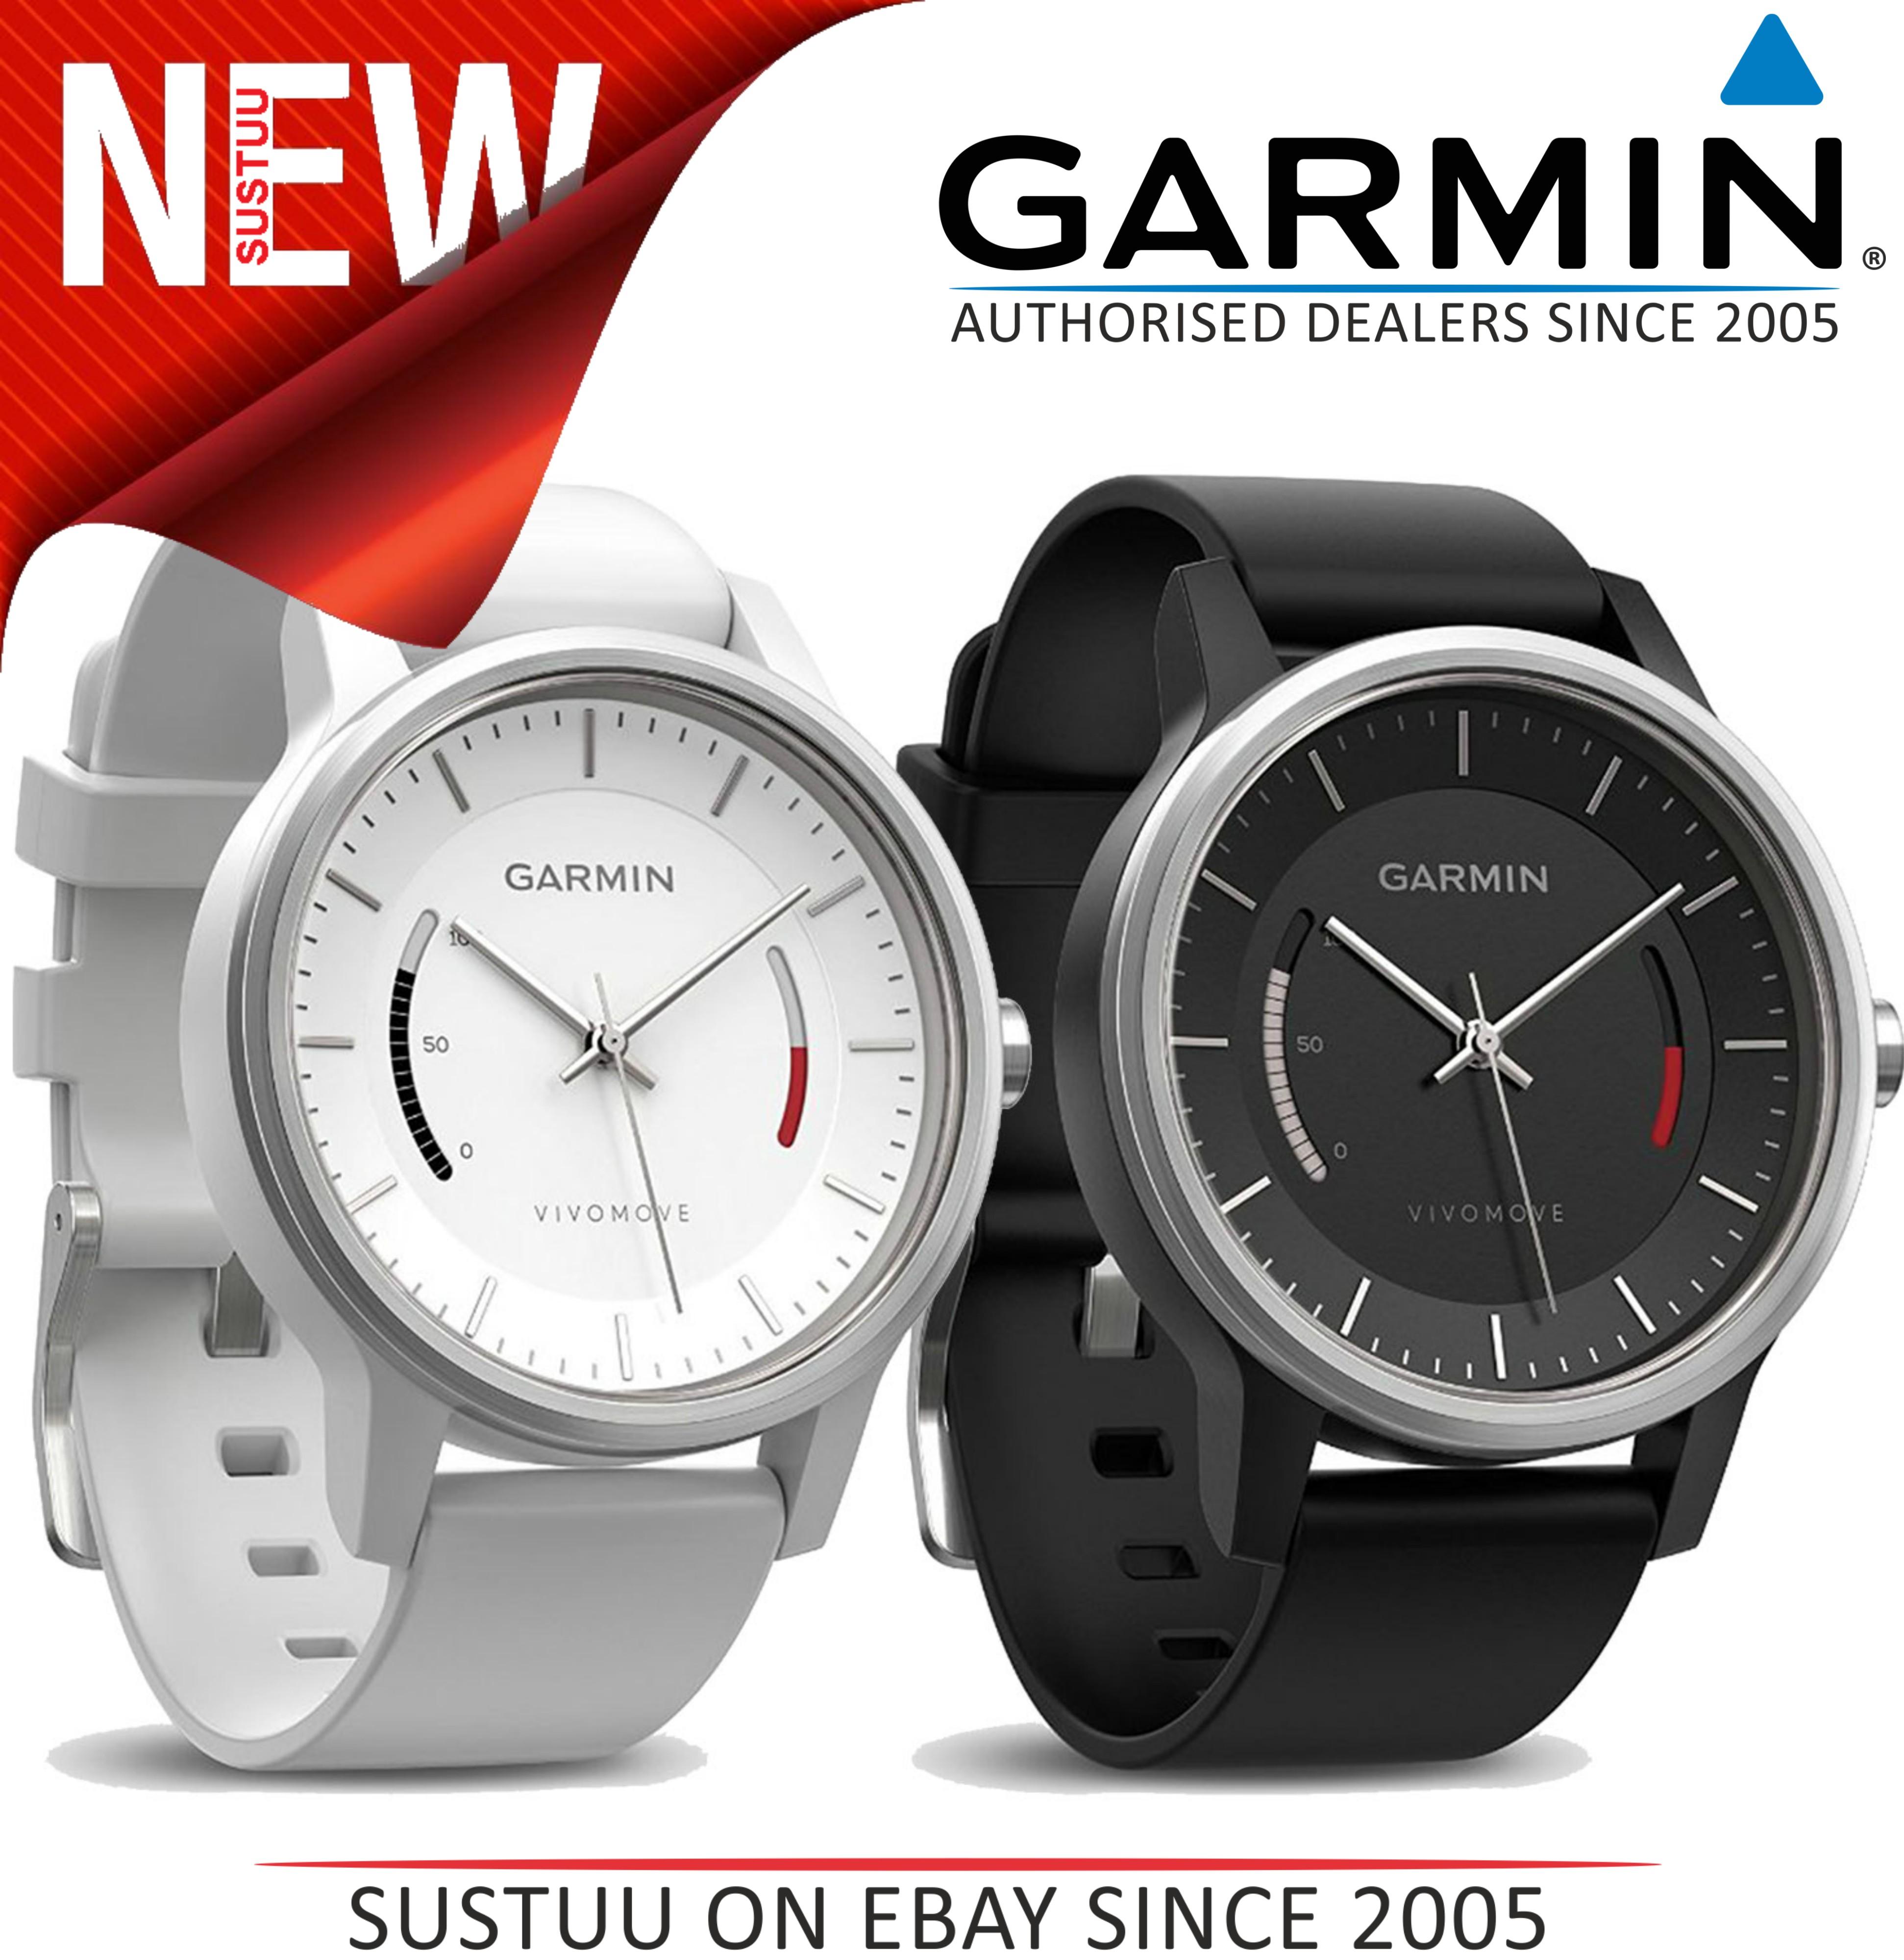 Garmin Vivomove?Analog Smart Watch?Activity Tracker?Sleep Monitor?White - Black